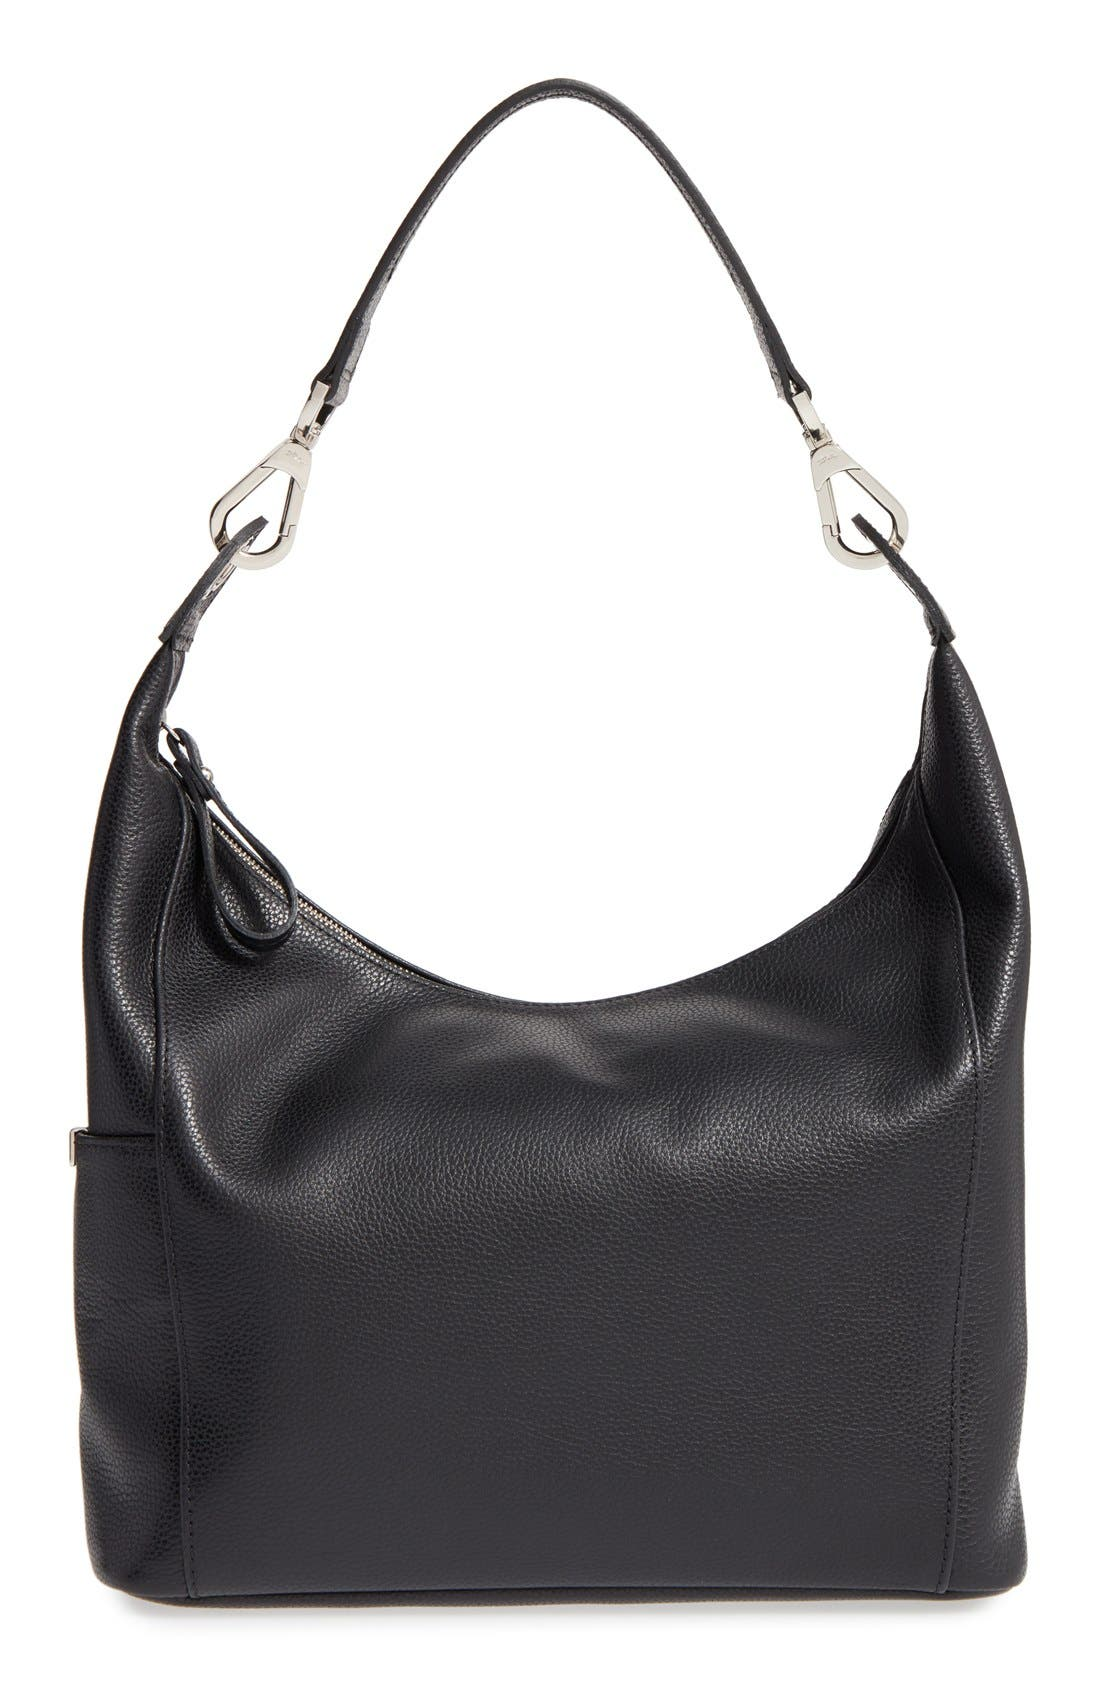 'Le Foulonne' Leather Hobo Bag,                         Main,                         color, BLACK